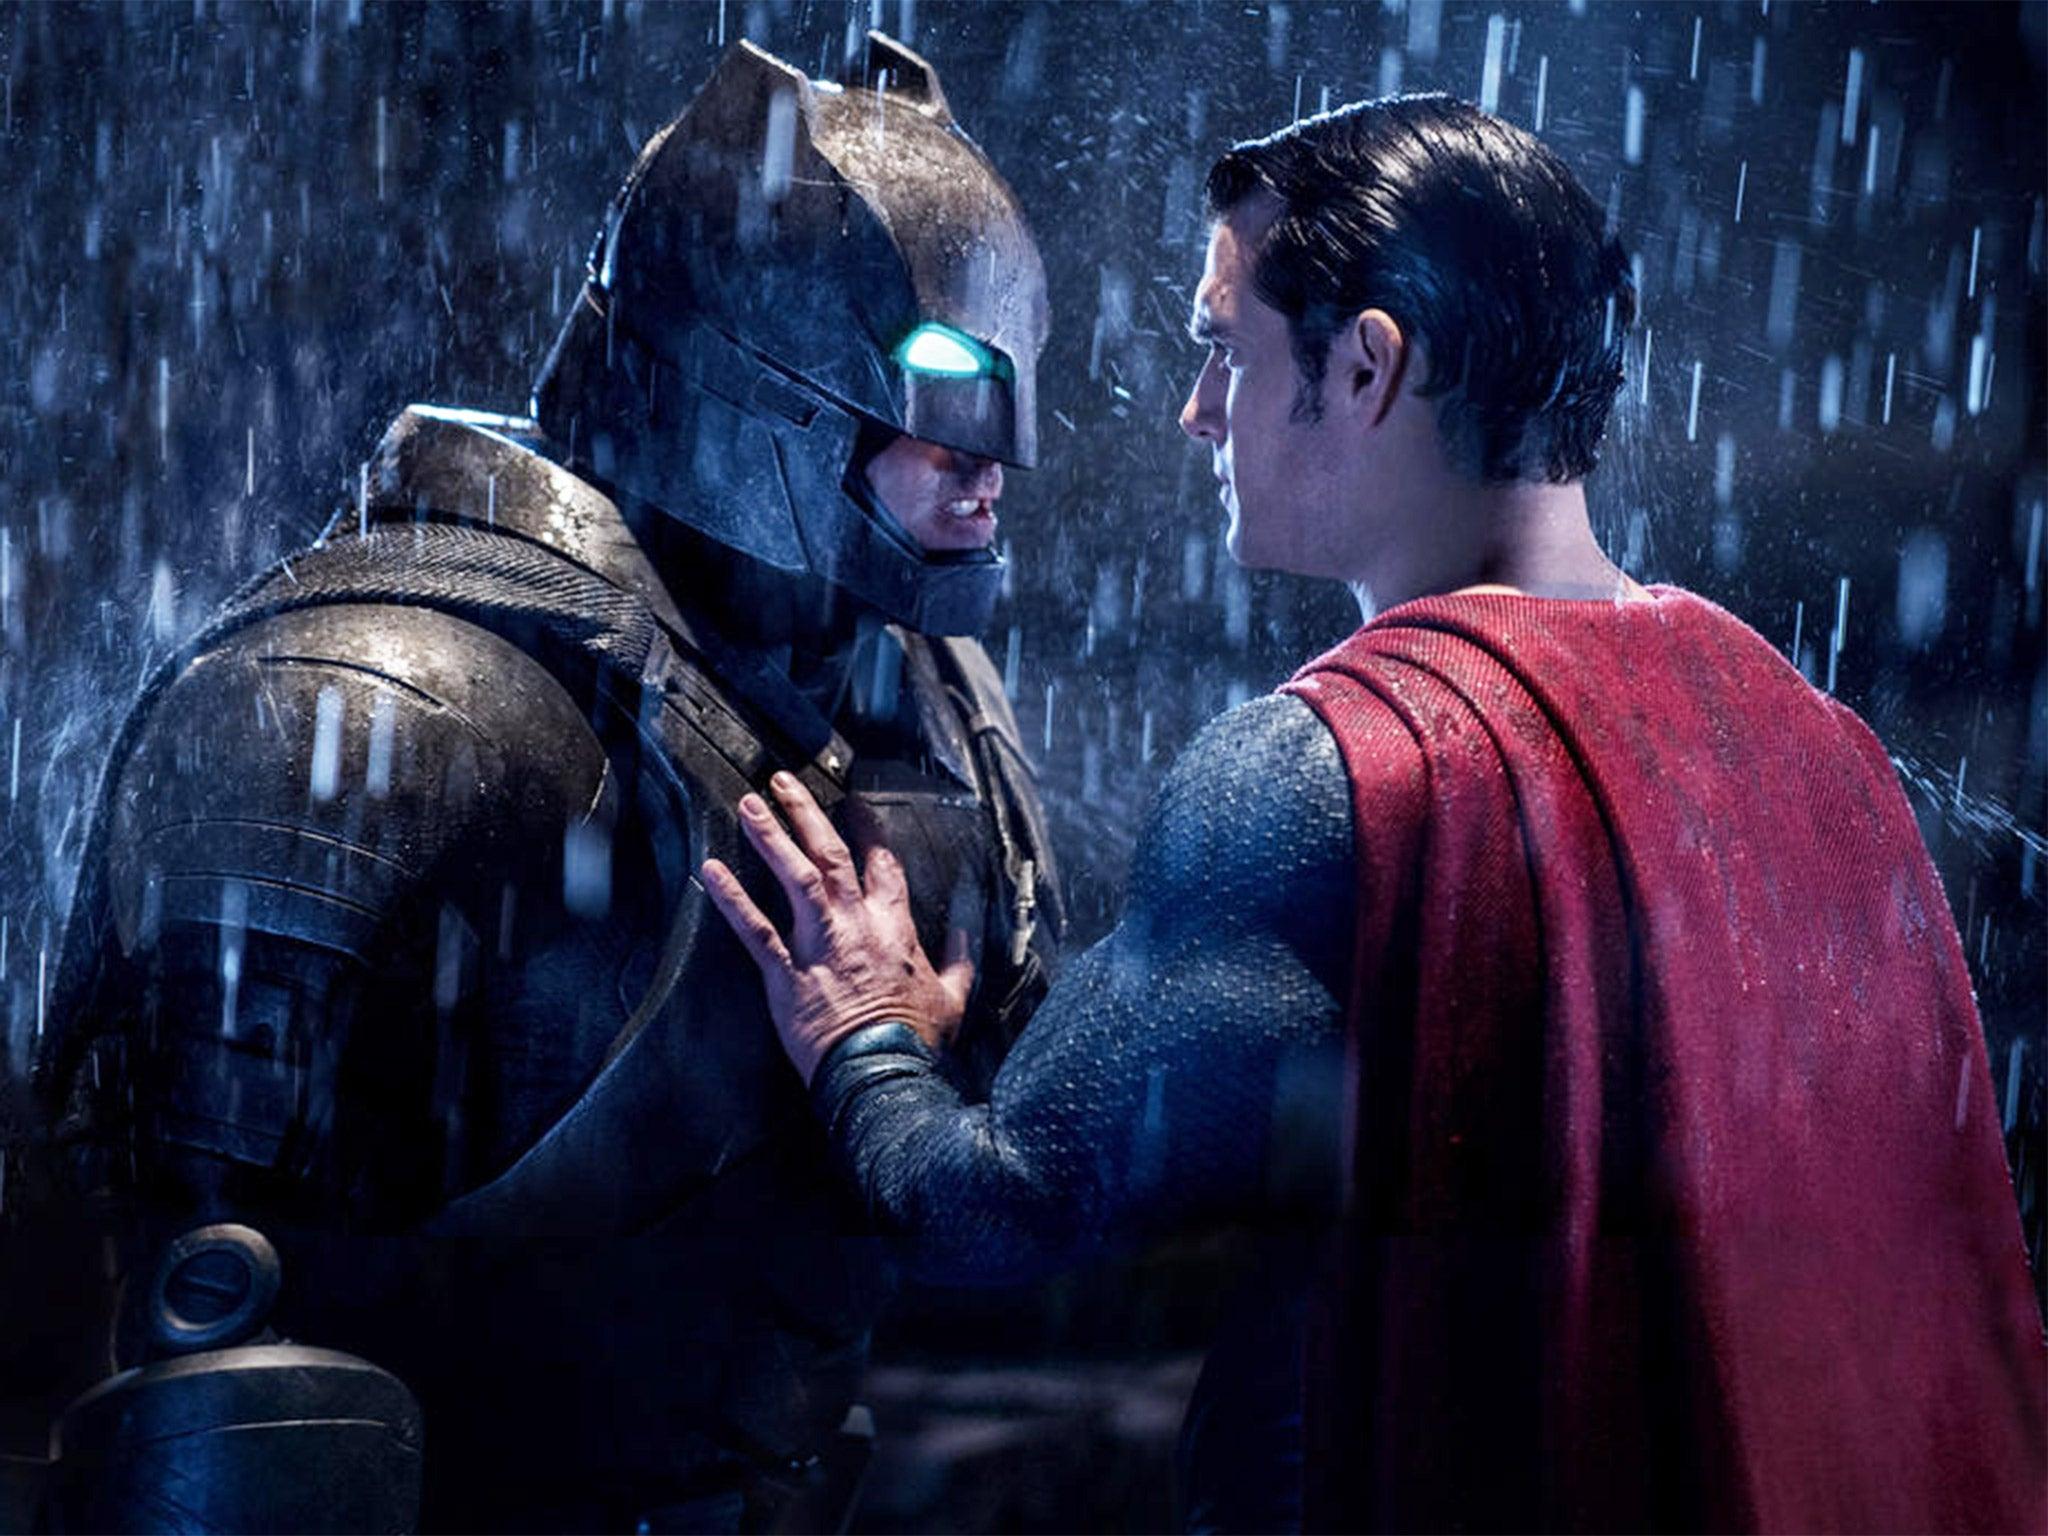 Batman v Superman has to make million at the box office to